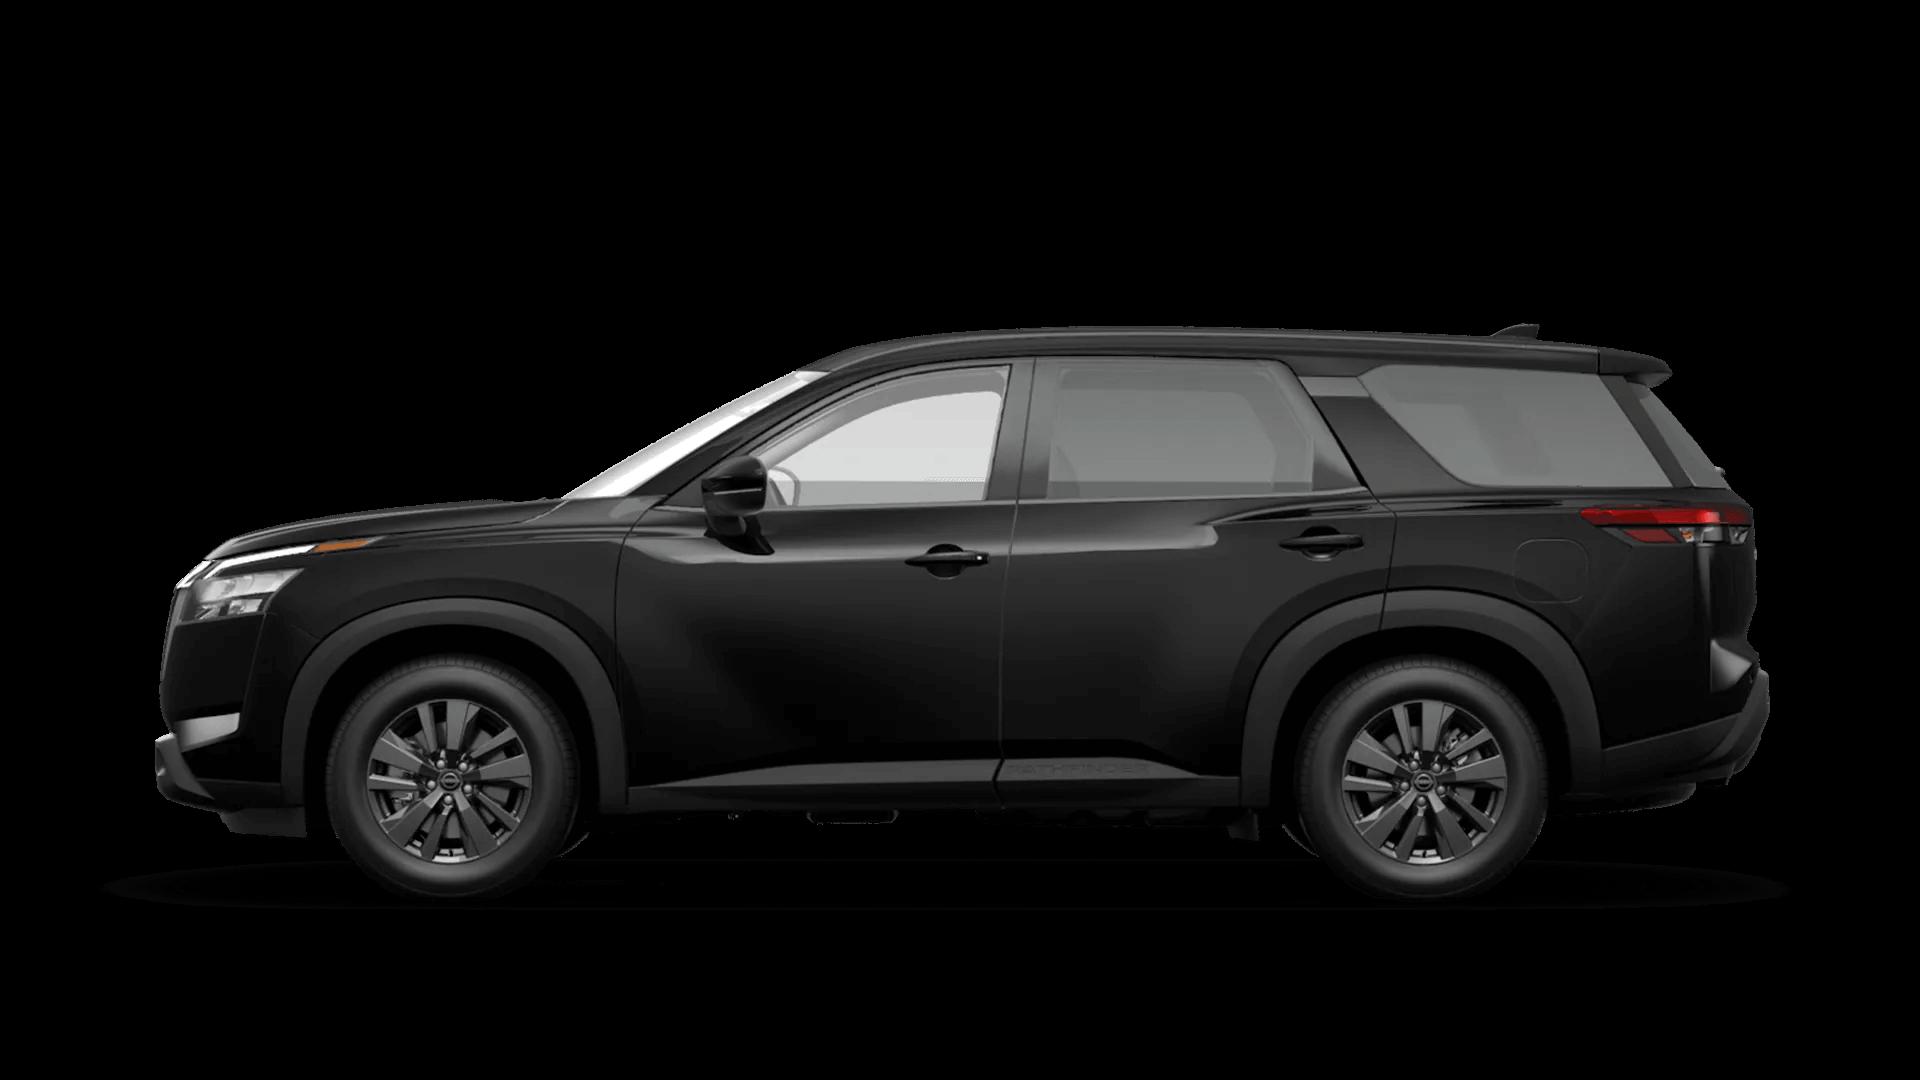 2022 Pathfinder® S 2WD in Super Black